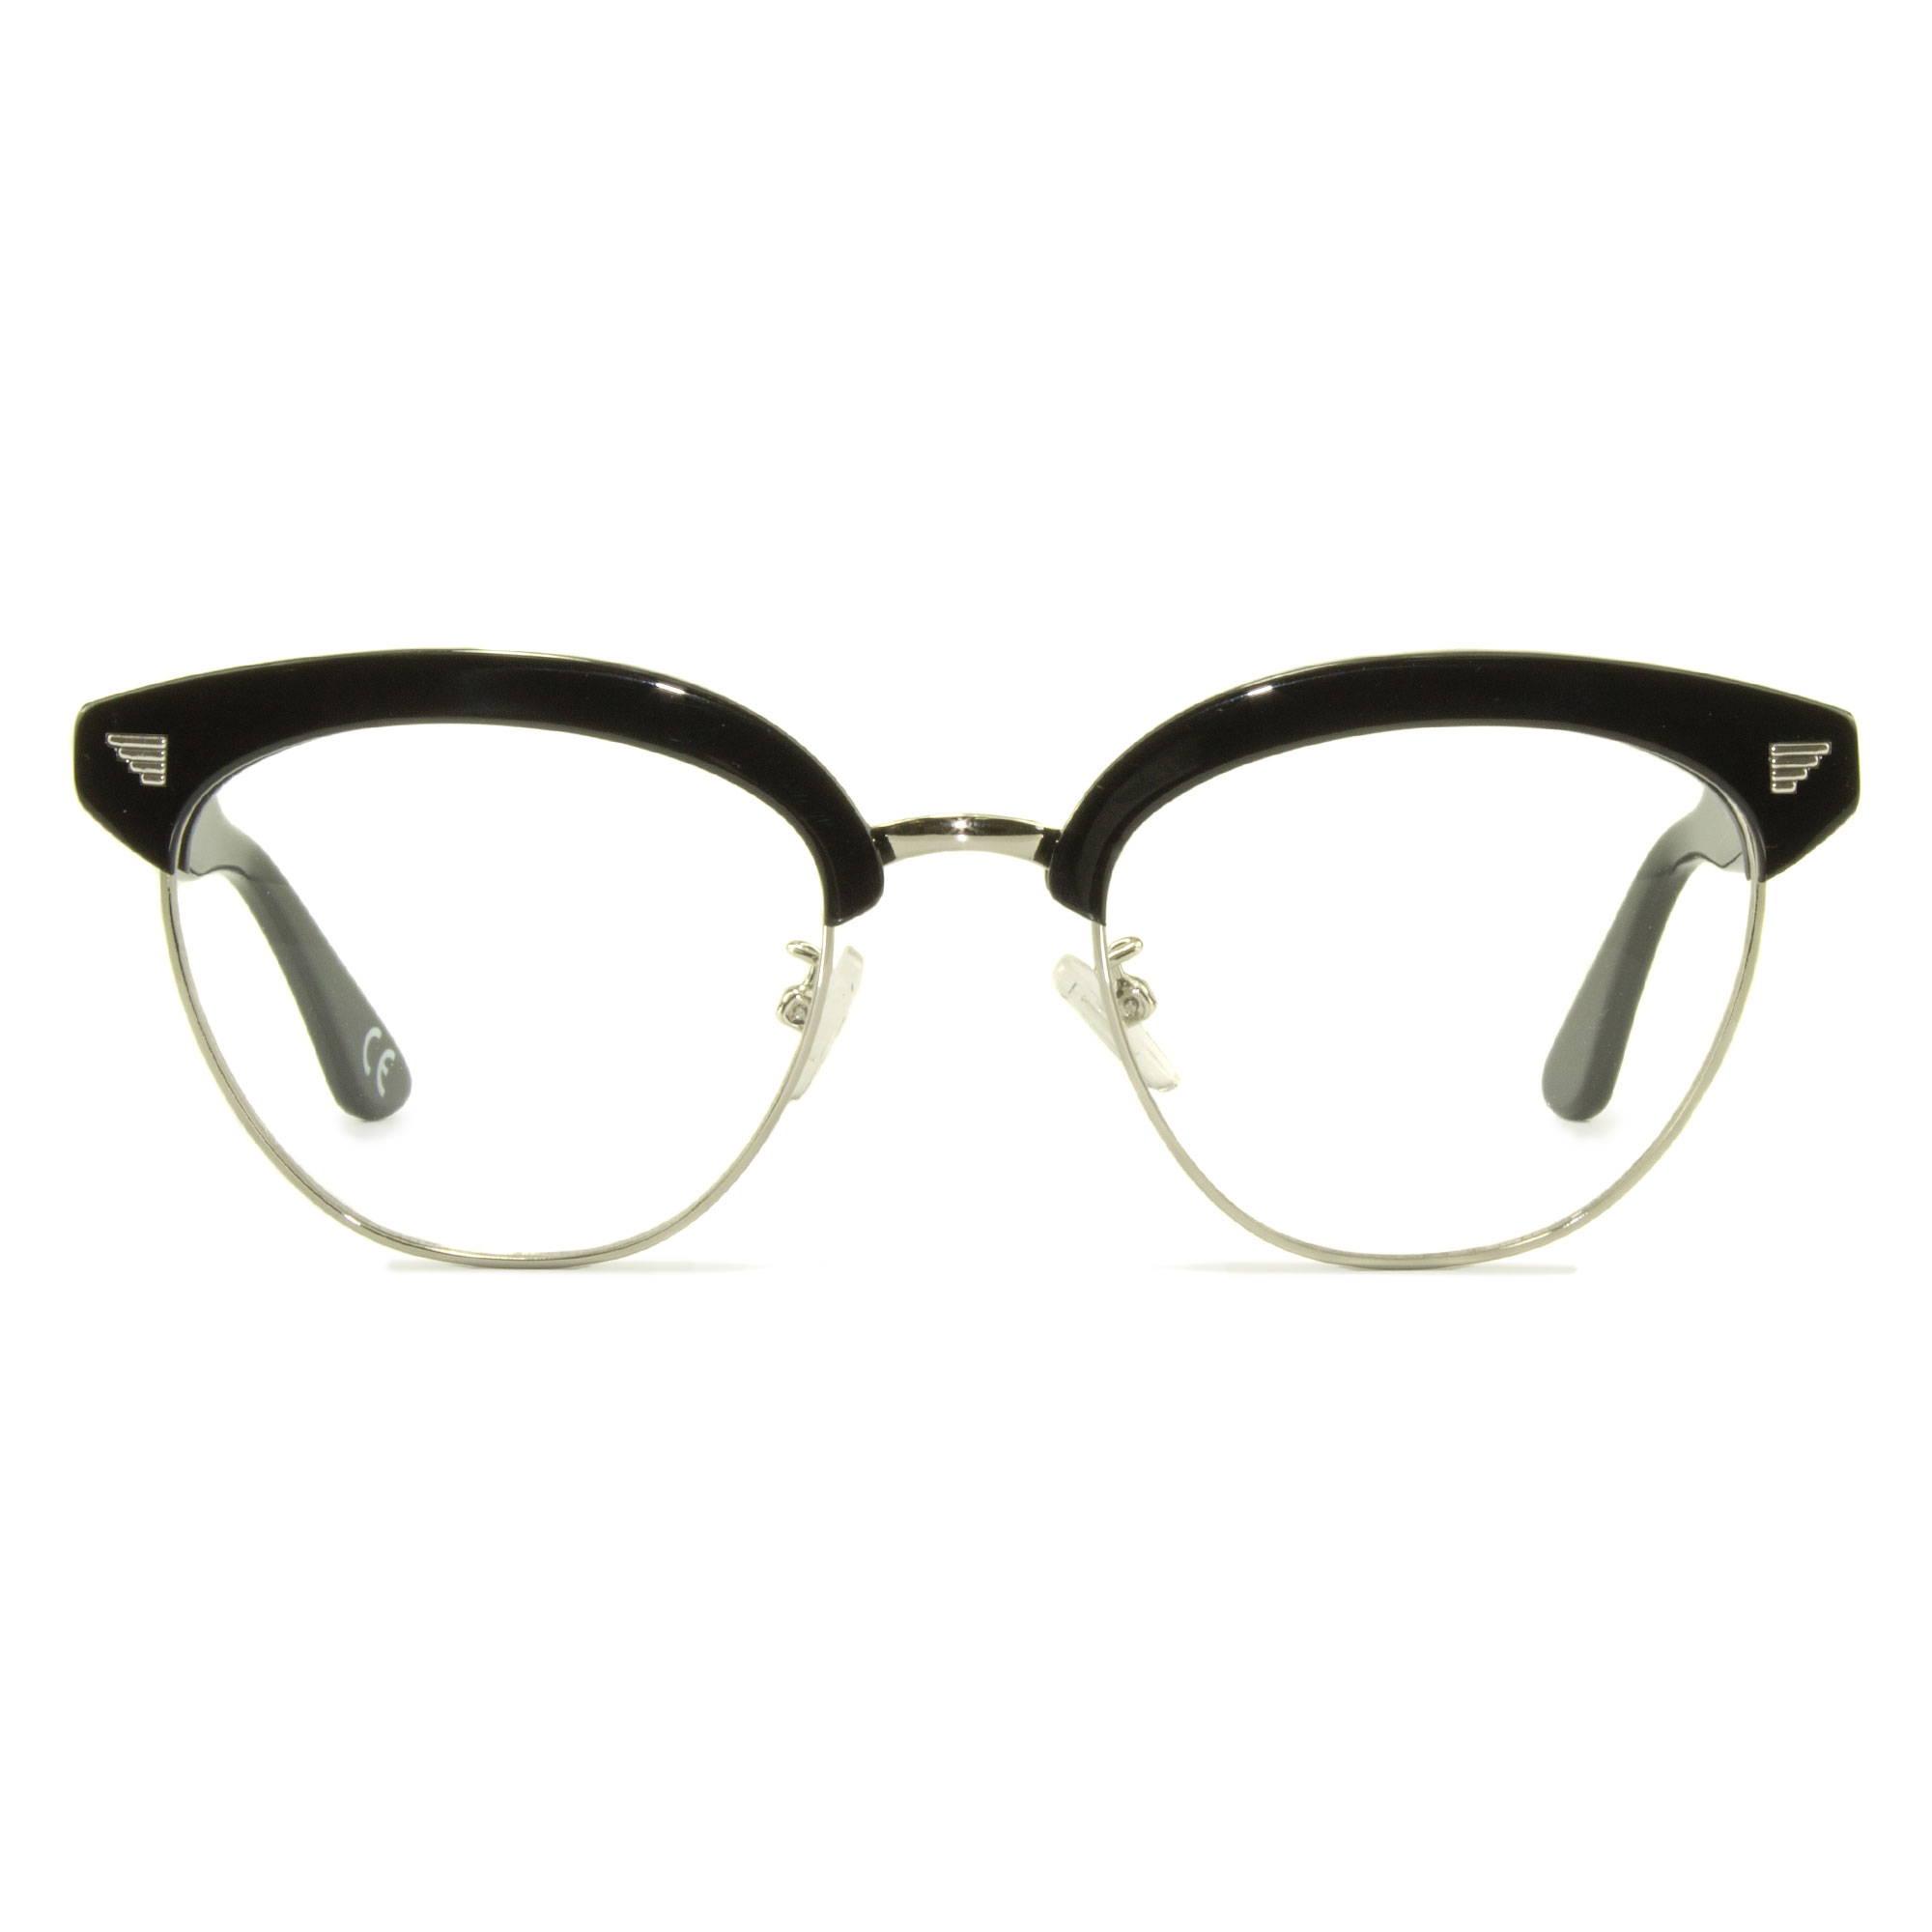 Joiuss malcolm black glasses